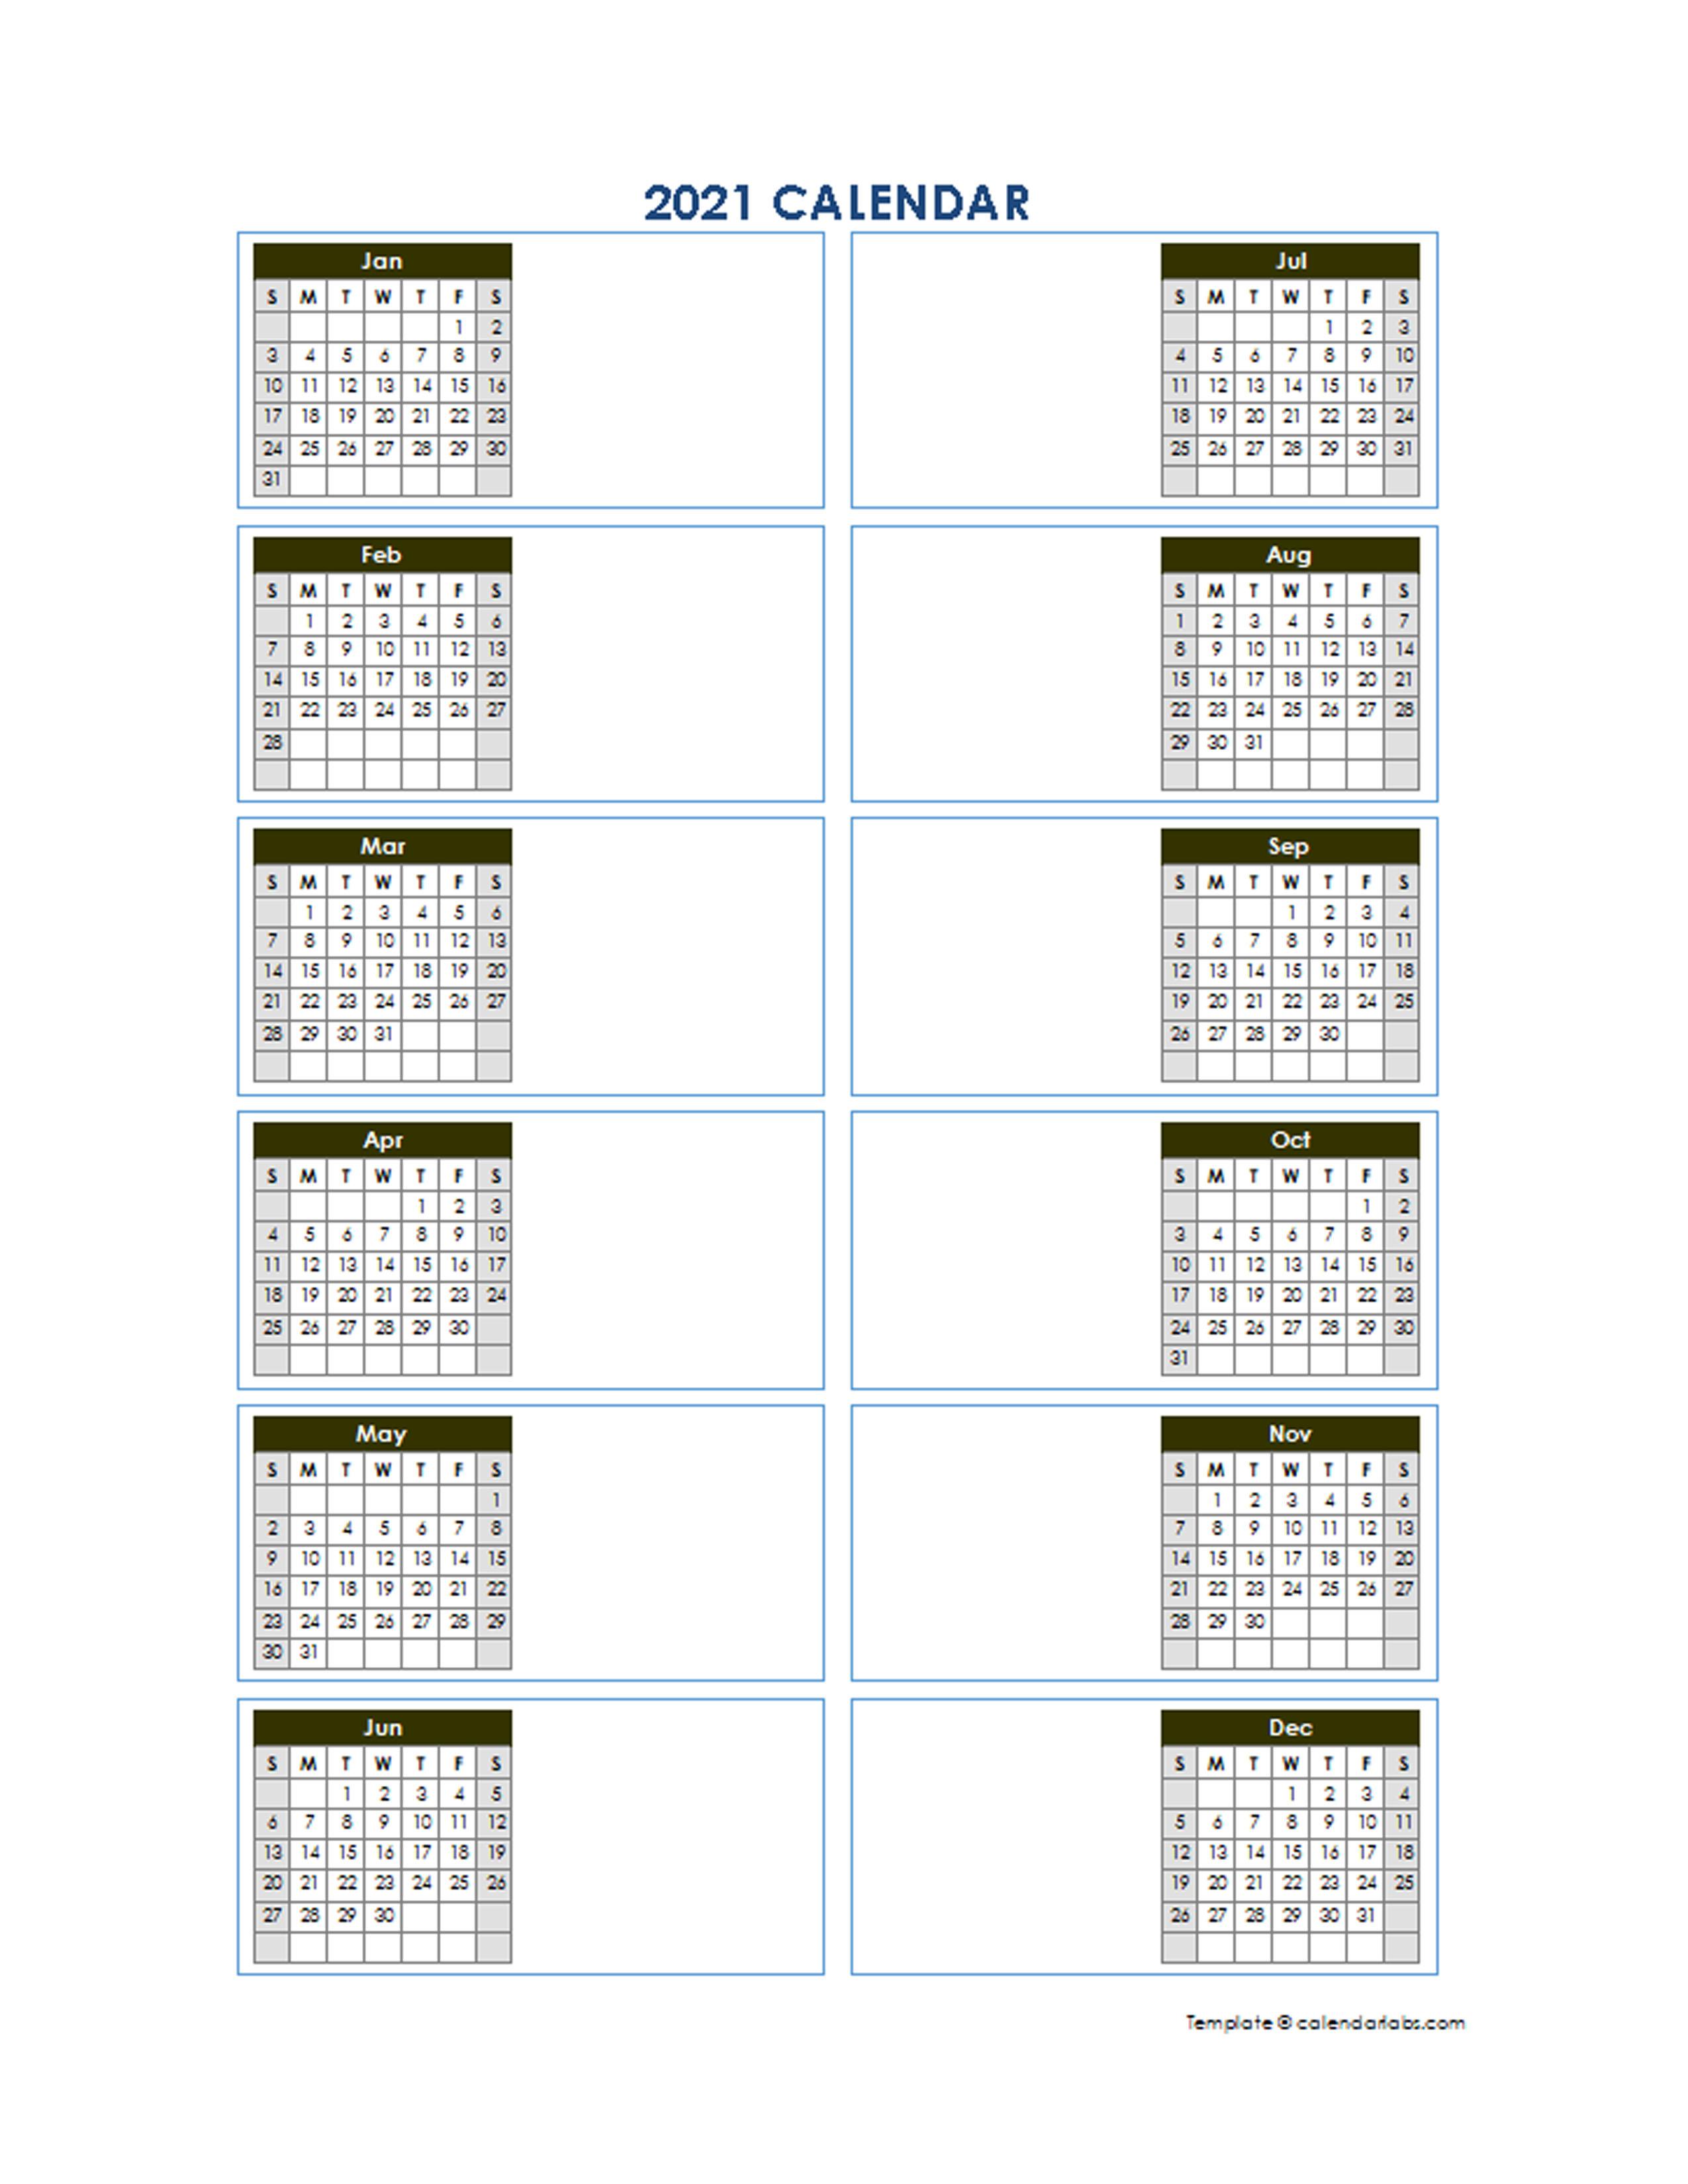 2021 Blank Yearly Calendar Template Vertical Design - Free ...